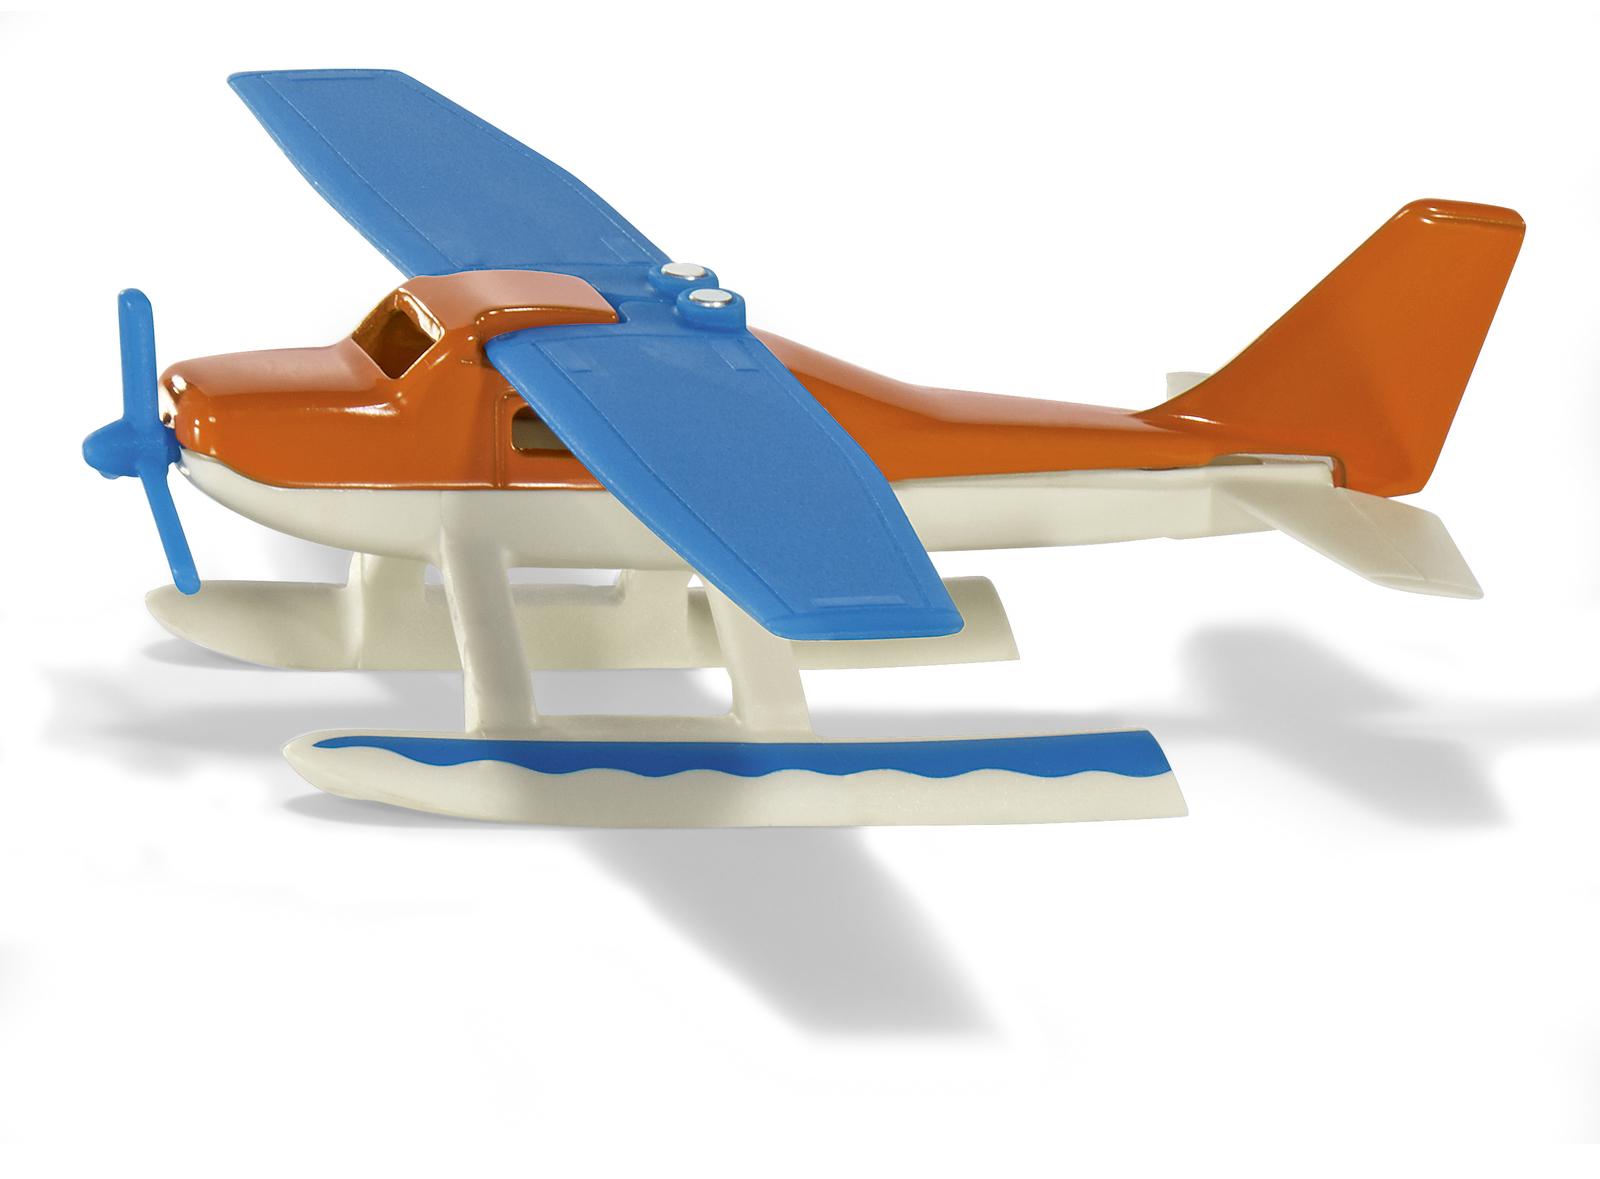 Siku: Seaplane image